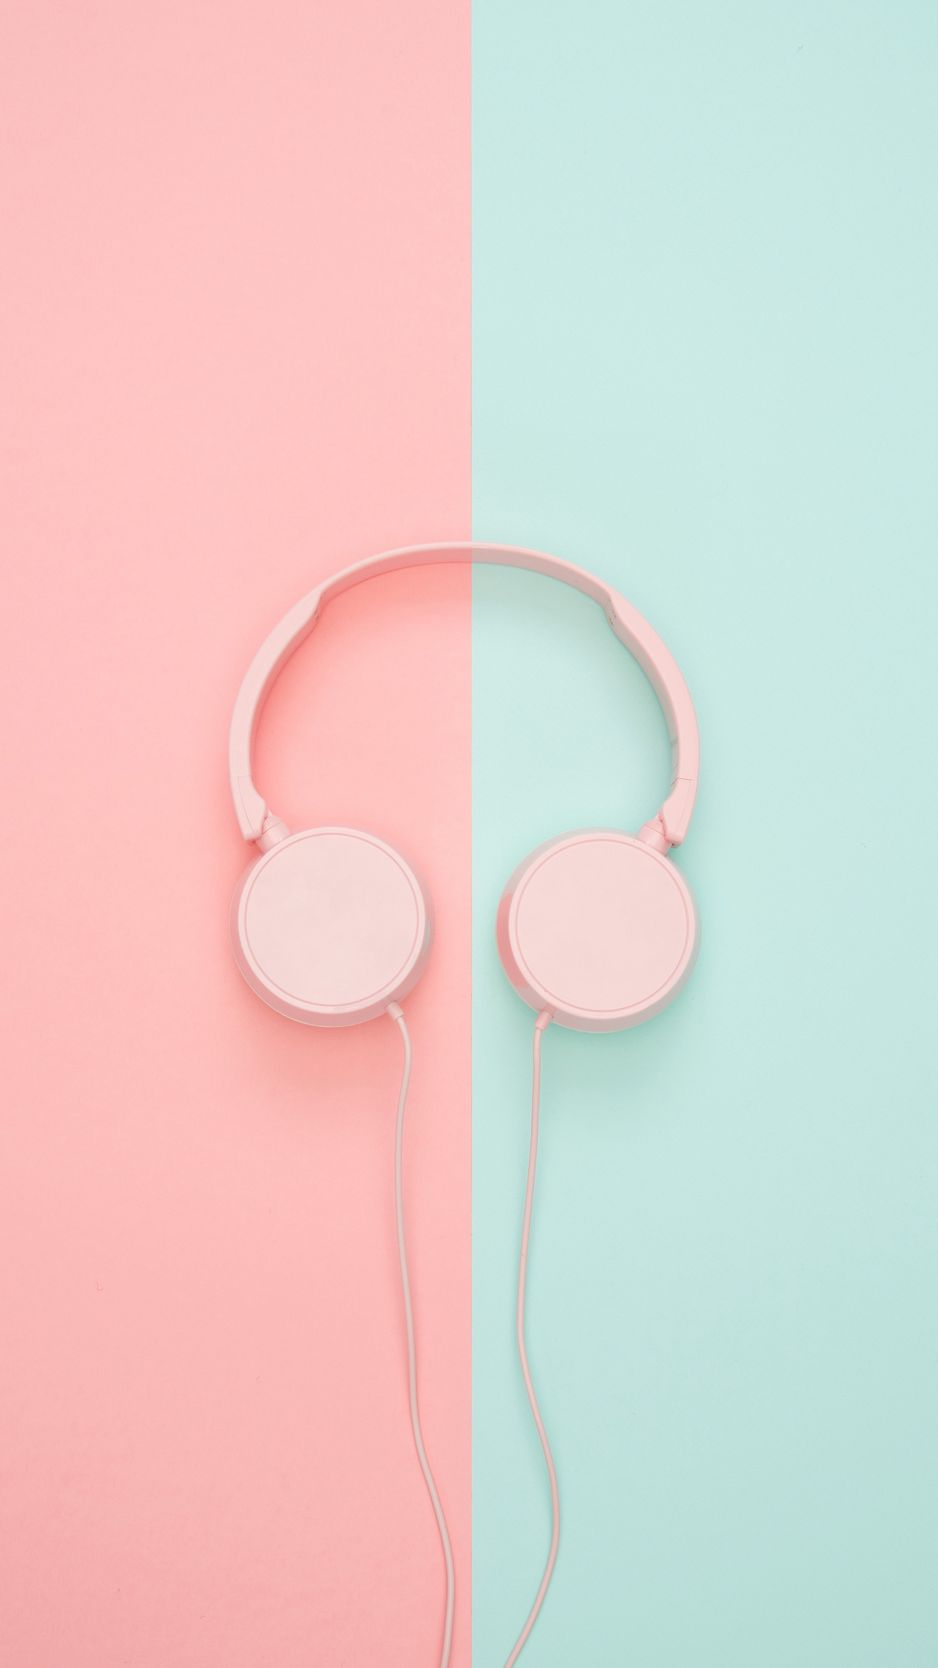 938x1668 Wallpaper headphones, minimalism, pink, pastel